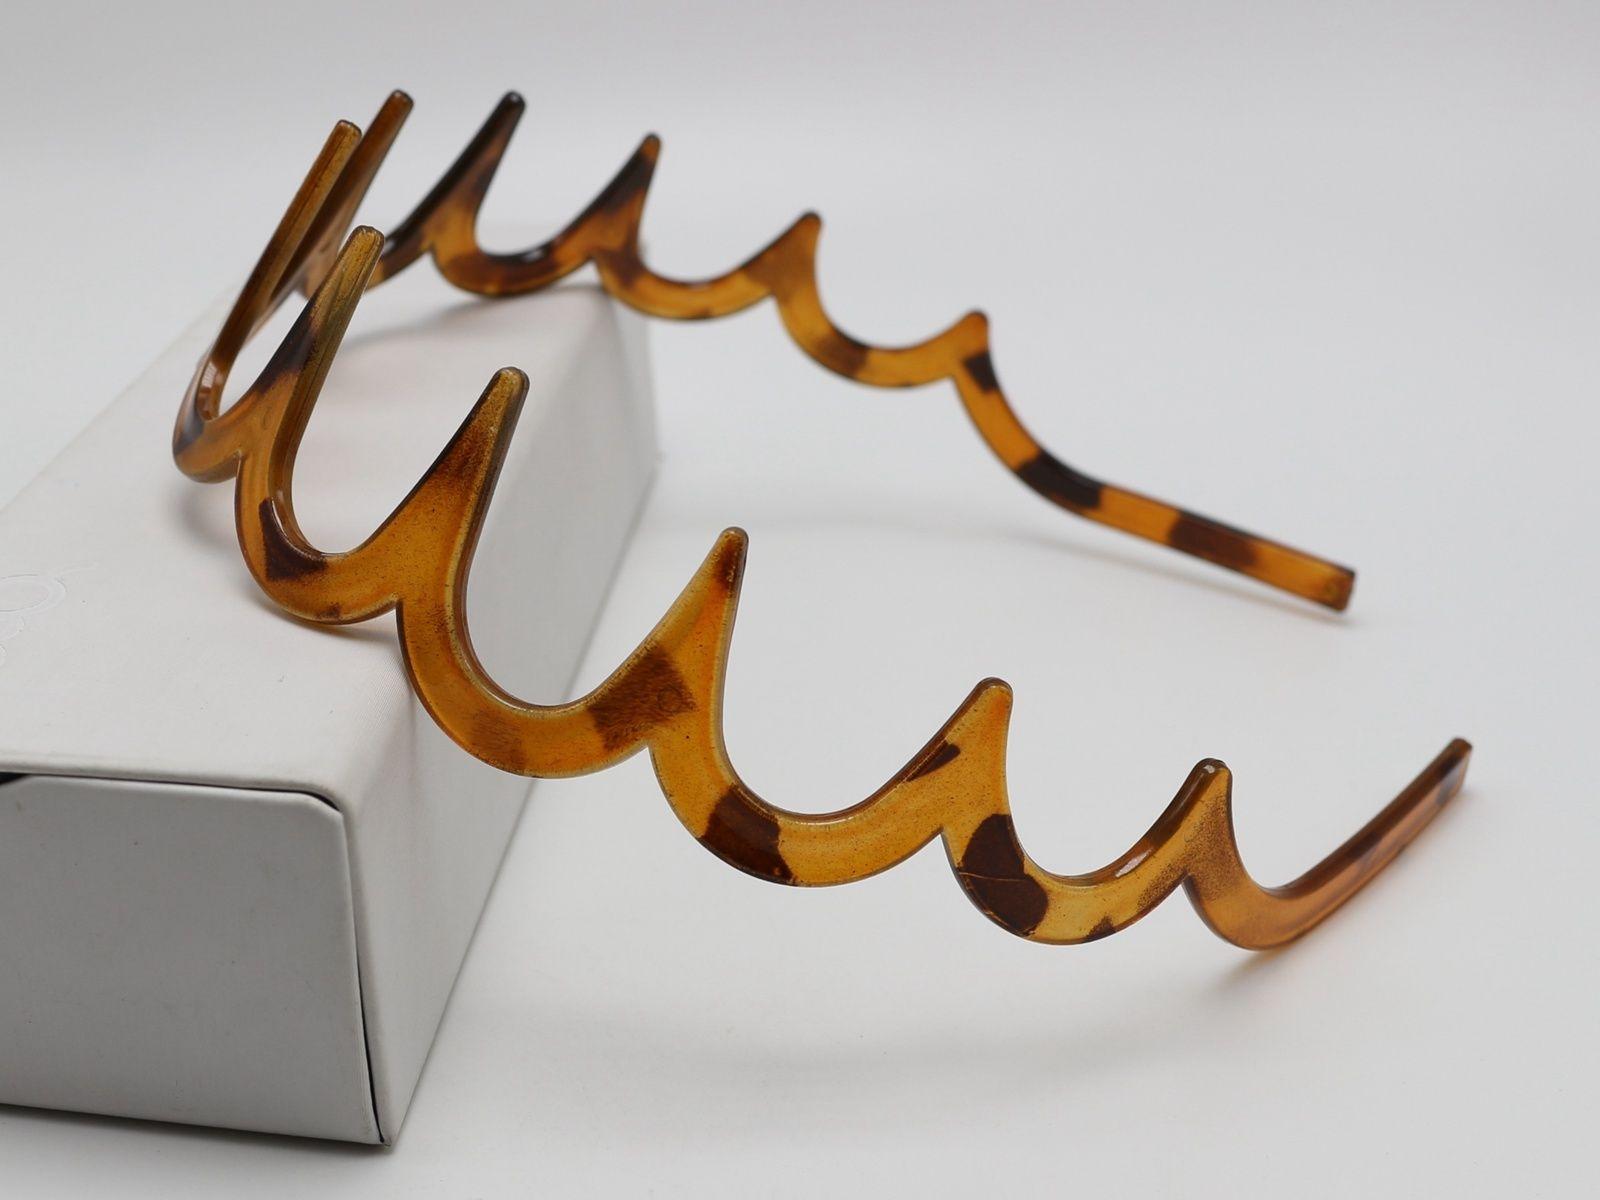 8 Coffee Plastic Wave Hair Band Comb Headband 32mm with Deep Teeth Hair Accessor